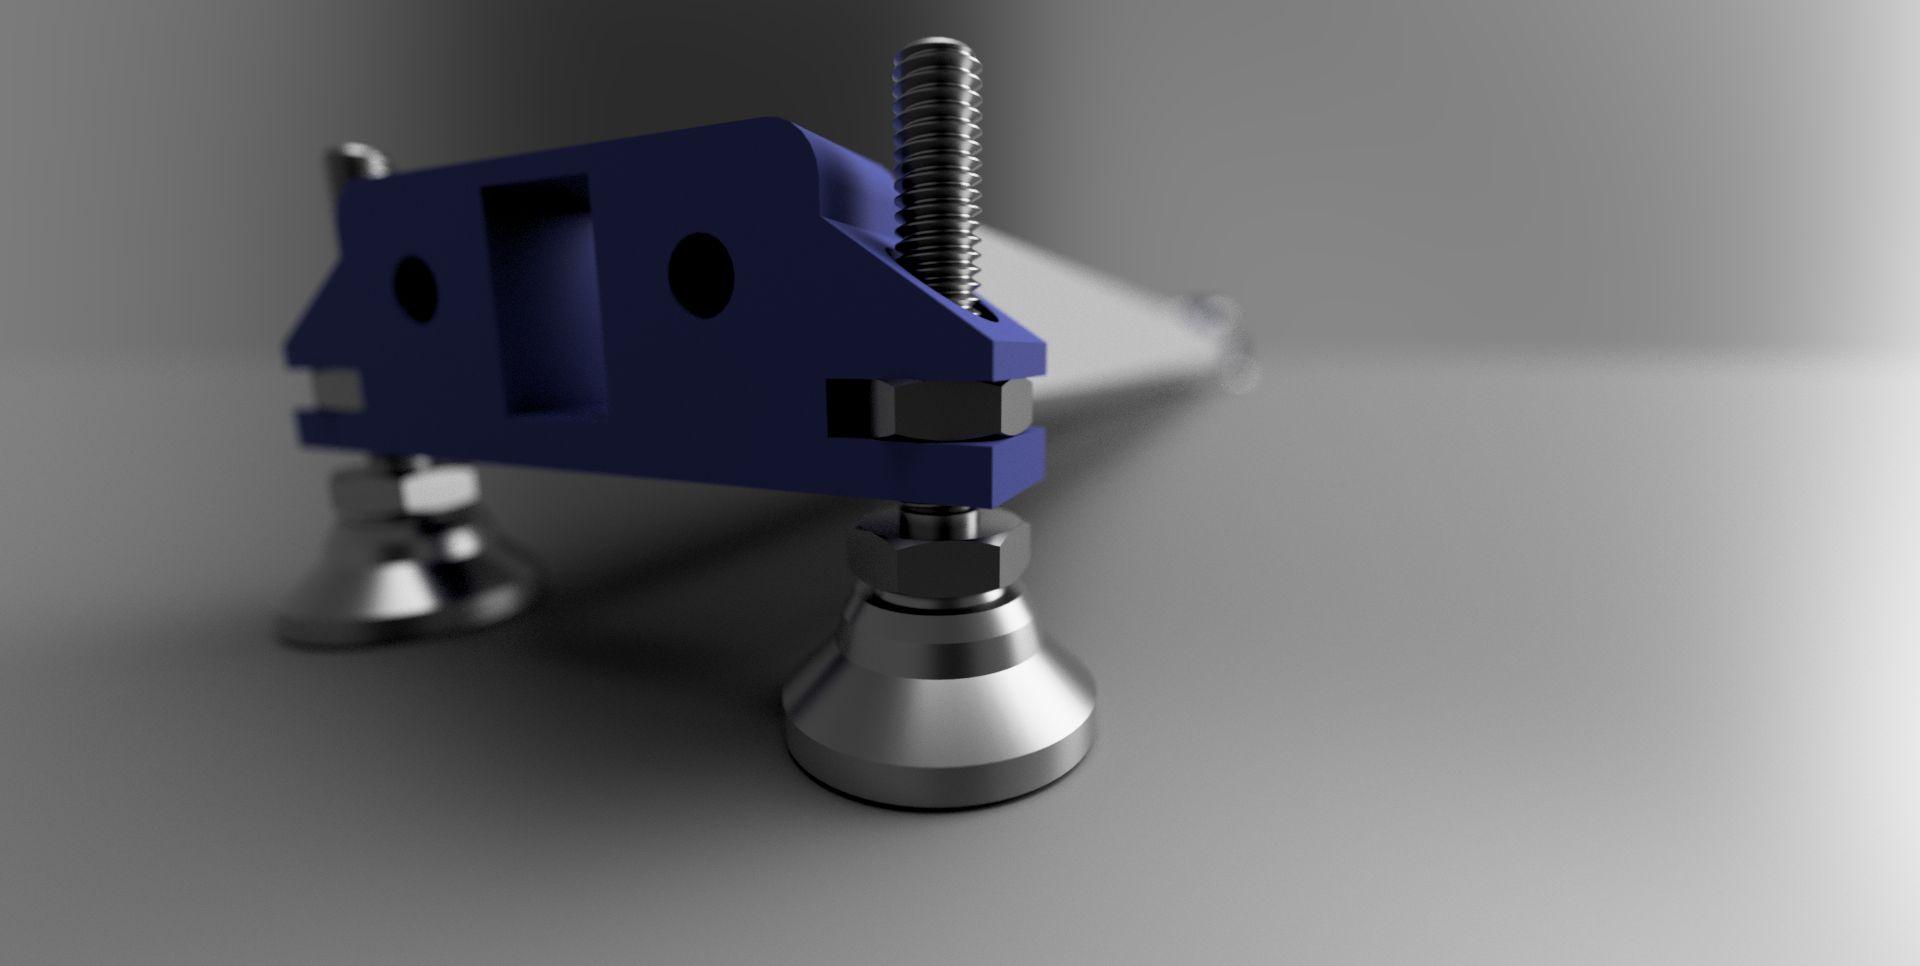 Camera-slide-rail-v7-5-3500-3500